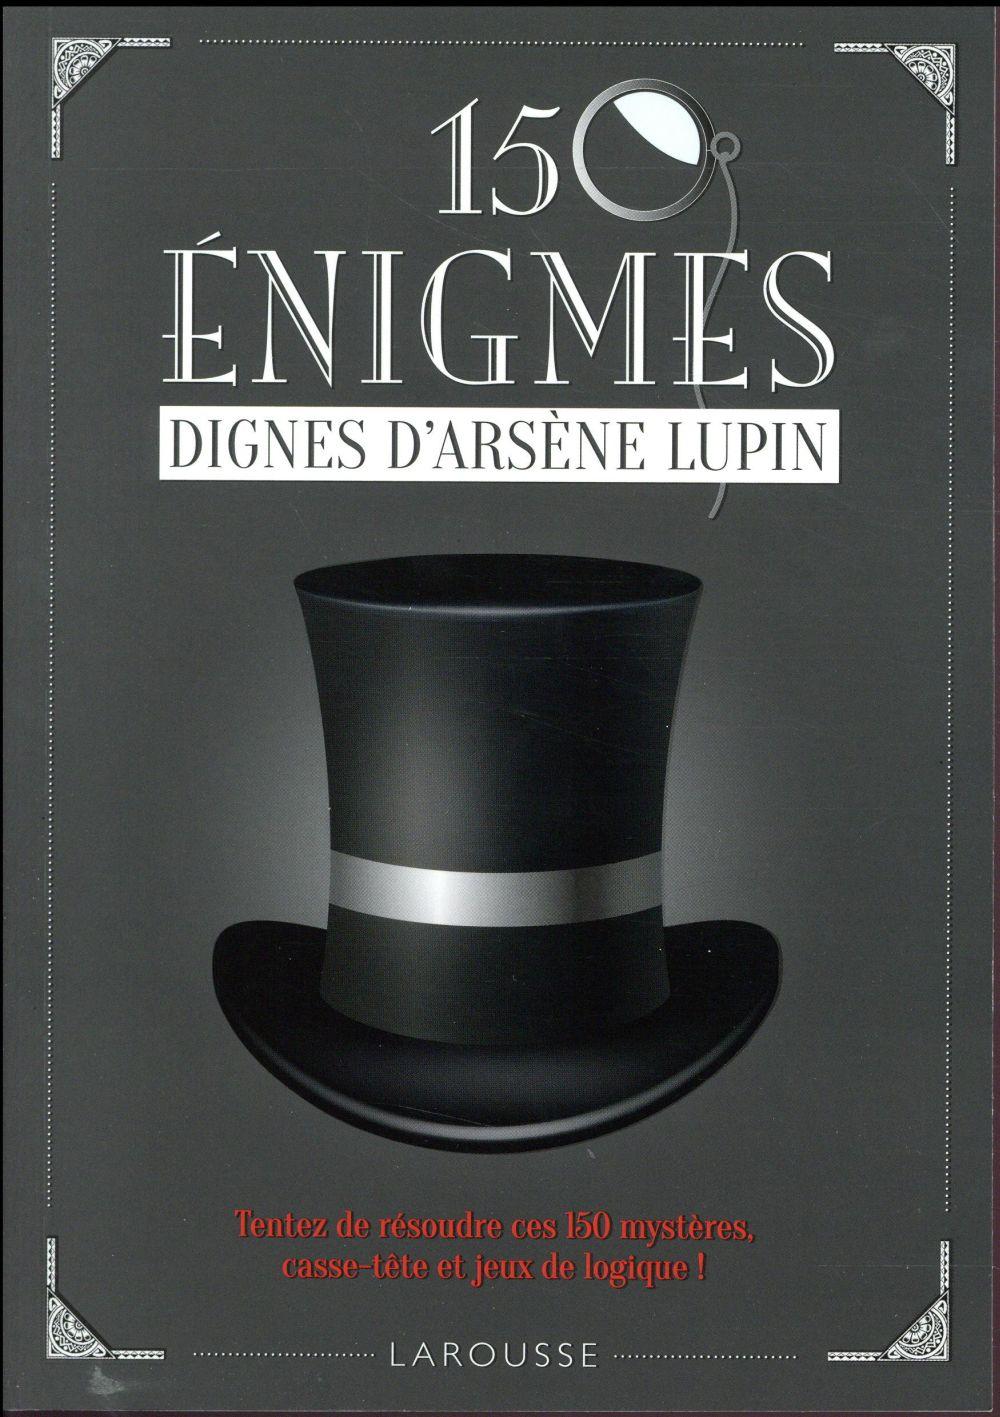 150 ENIGMES DIGNES D'ARSENE LUPIN XXX Larousse